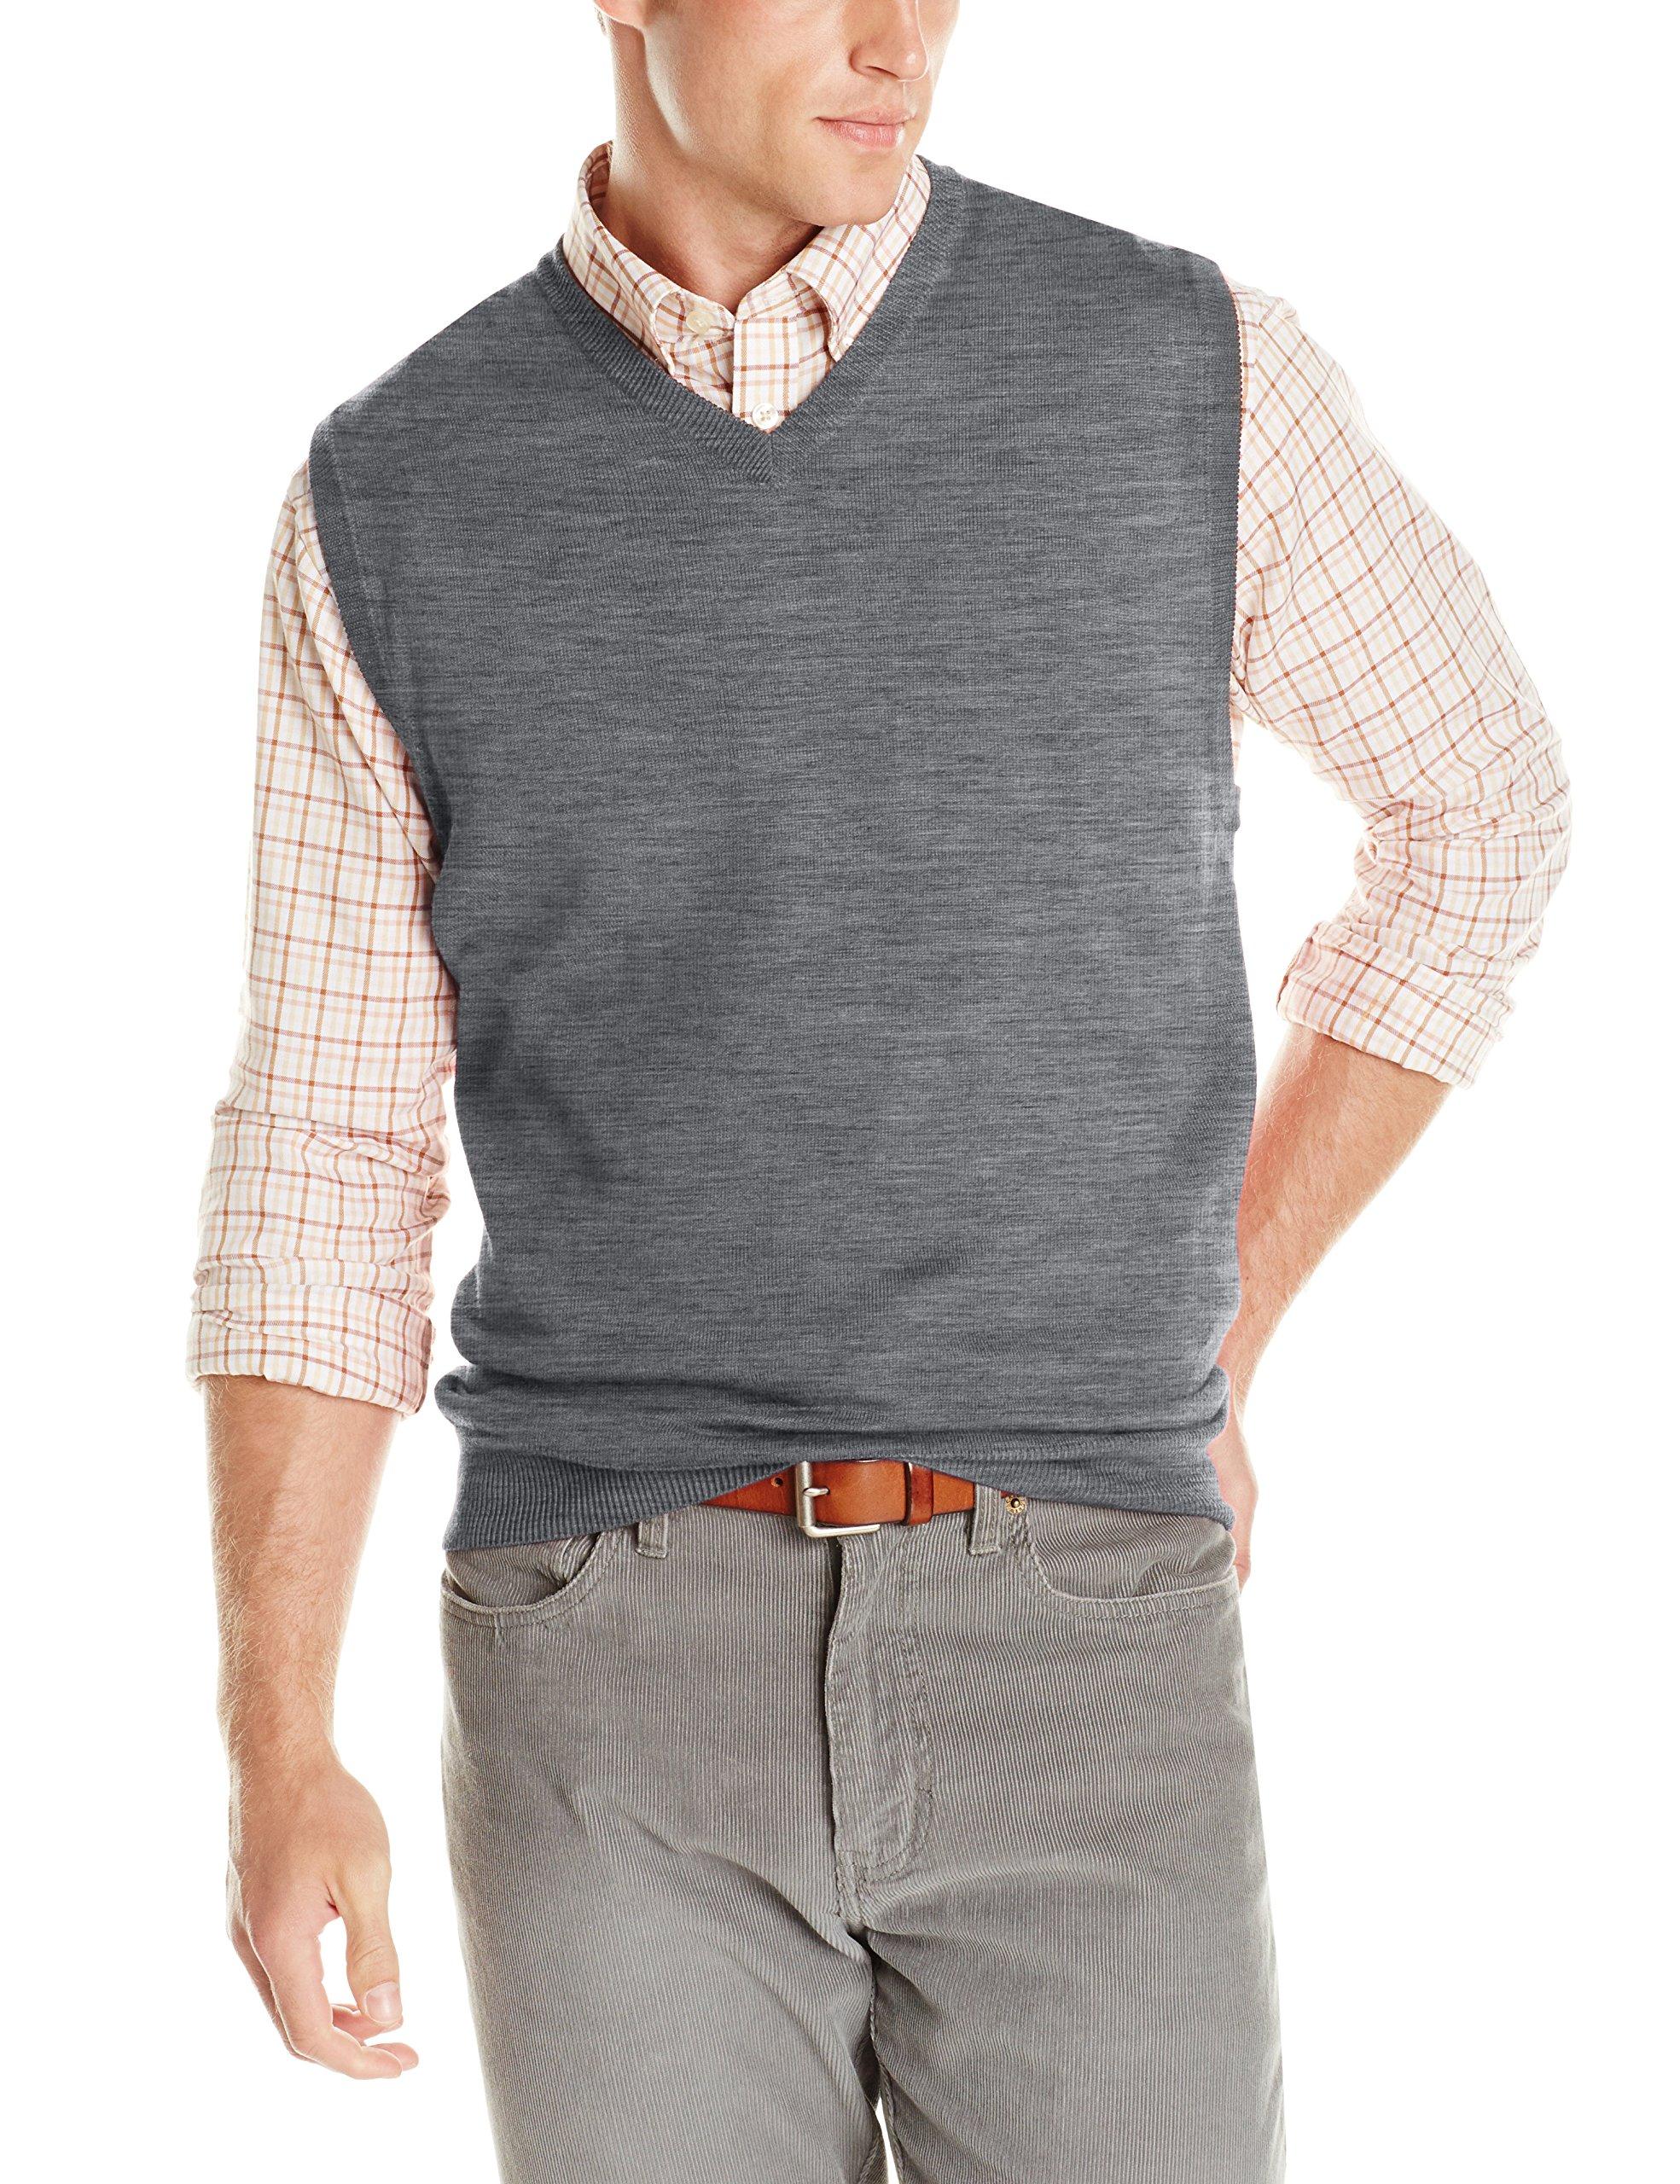 Cutter & Buck Men's Douglas V-Neck Sweater Vest, Medium Grey Heather, X-large